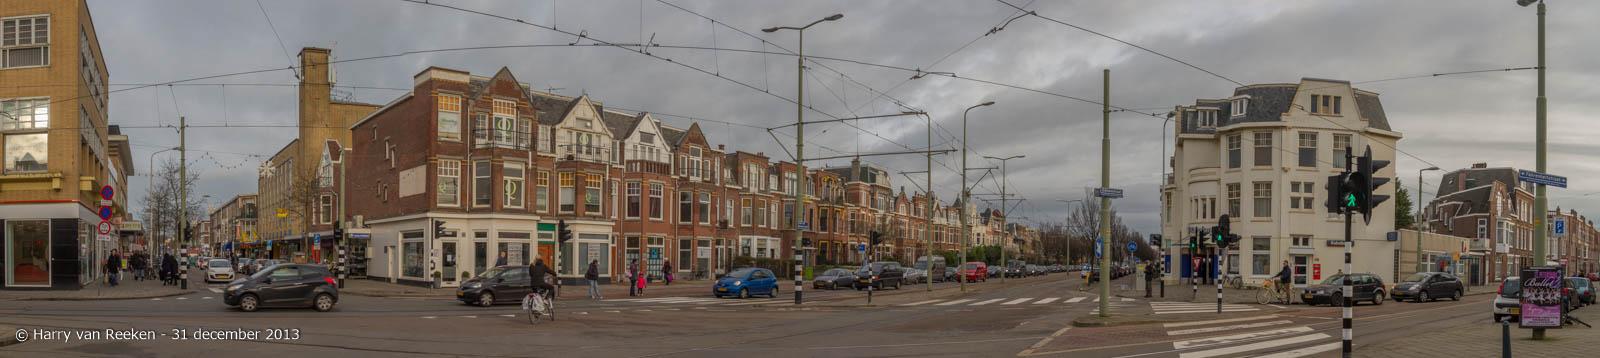 Laan van Meerdervoort-Edisonstraat-03-Pano